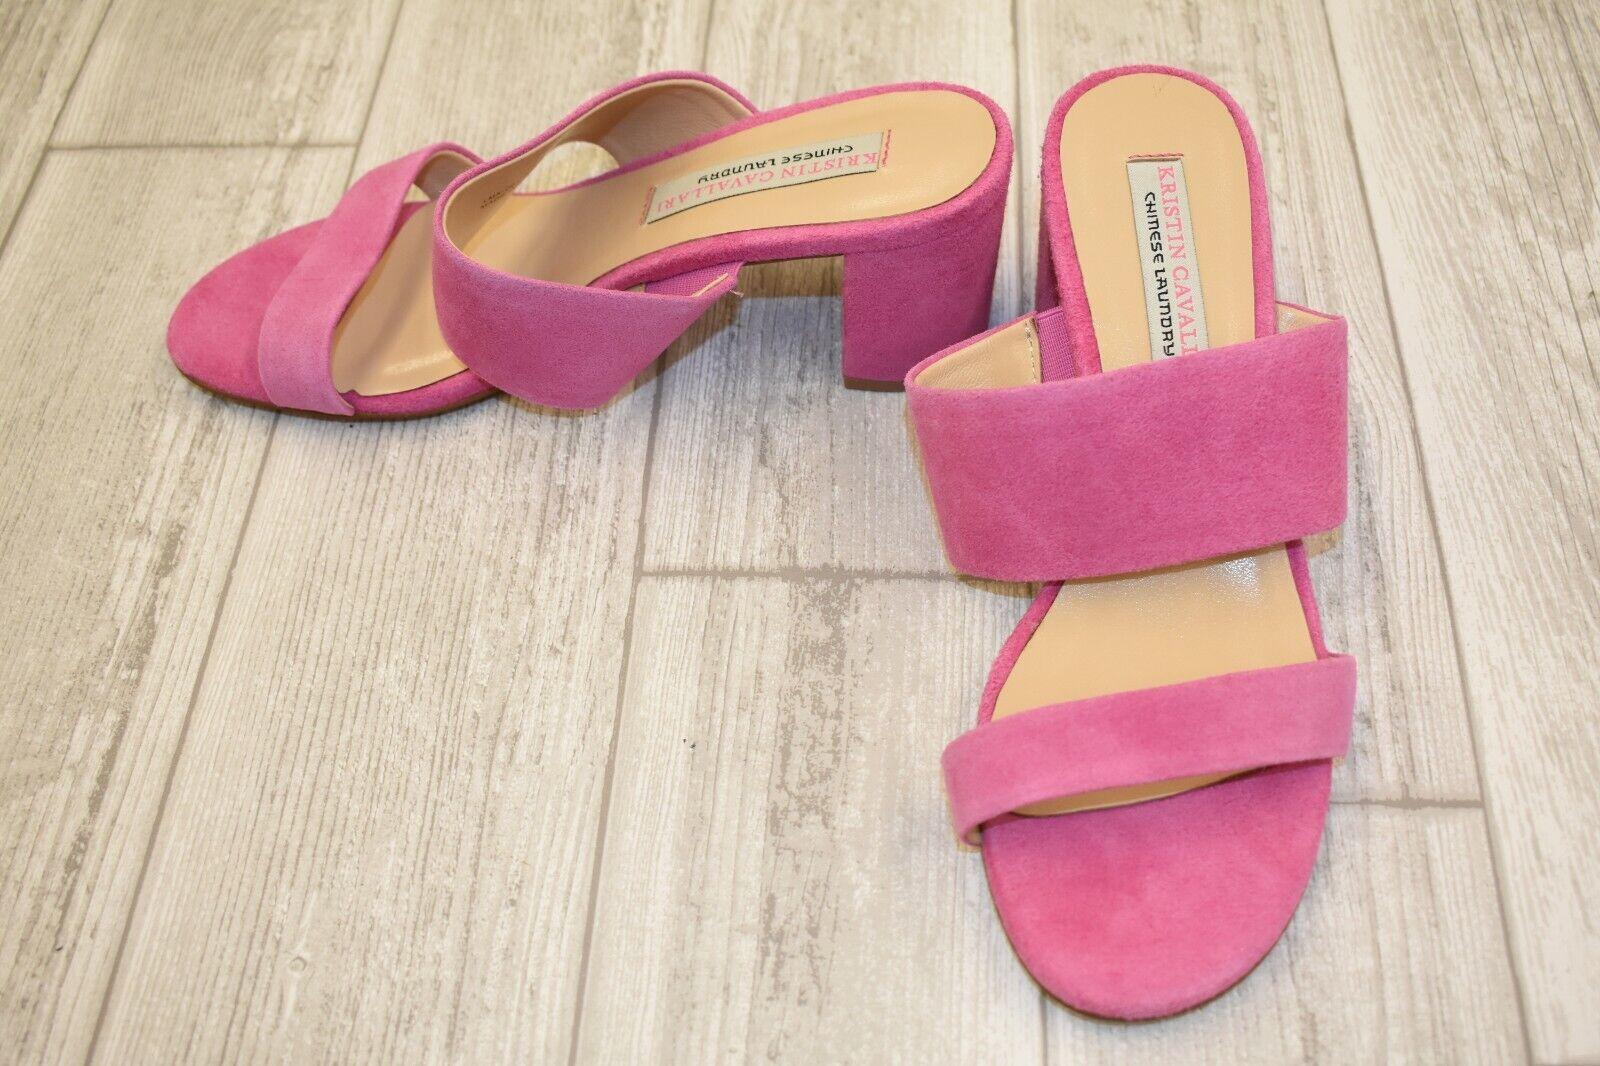 Kristin Cavallari Lakeview Suede Slide Sandals, Women's Size 7, Fuchsia